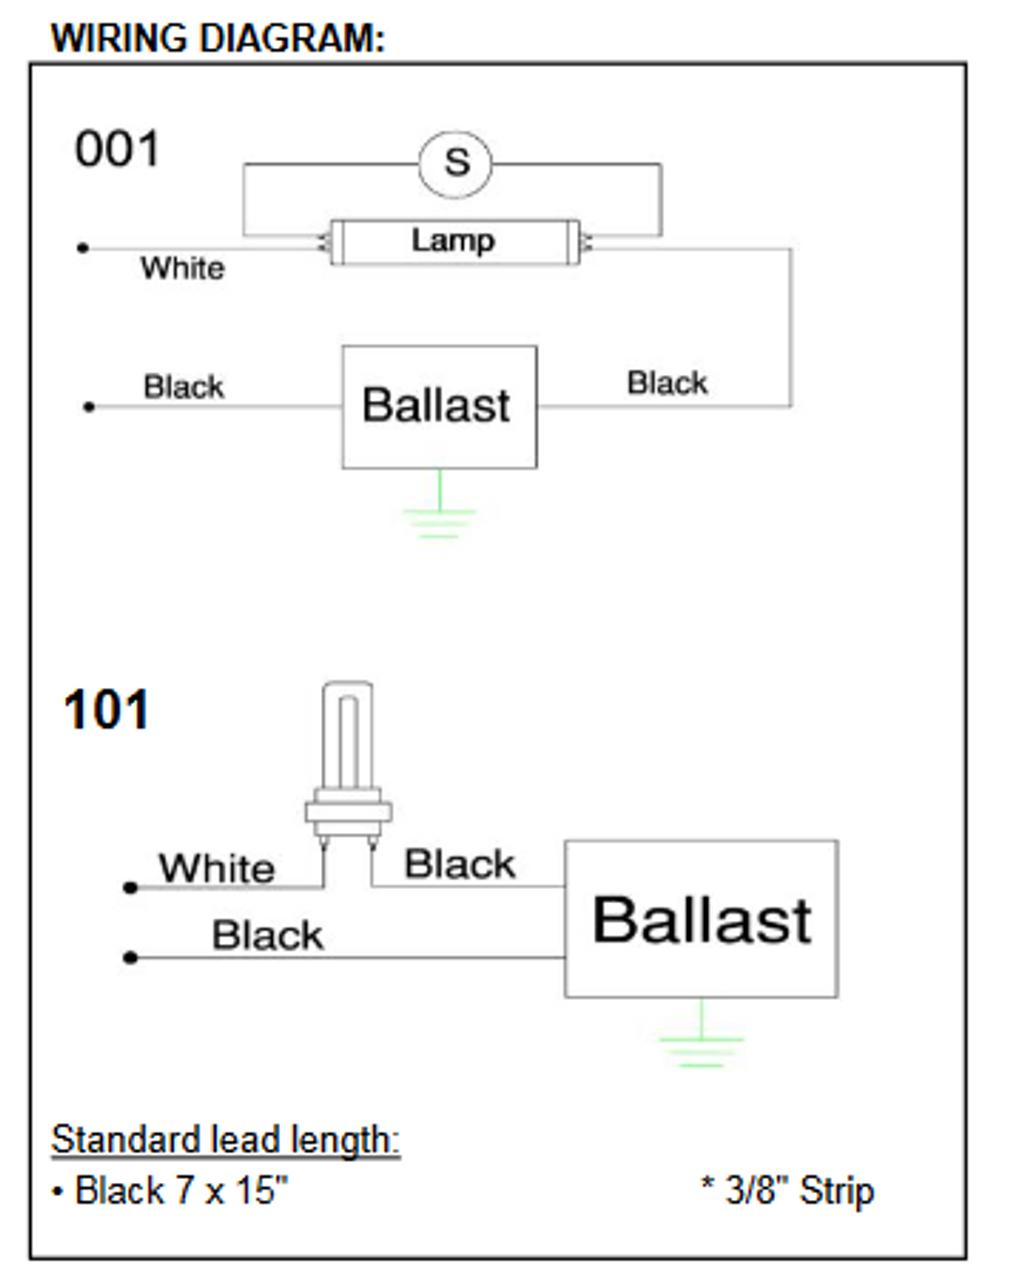 sp2pw sp2p robertson fluorescent replacement ballasts rh ballastshop com LED Ballast Wiring Diagram Electronic Ballast Wiring Diagram